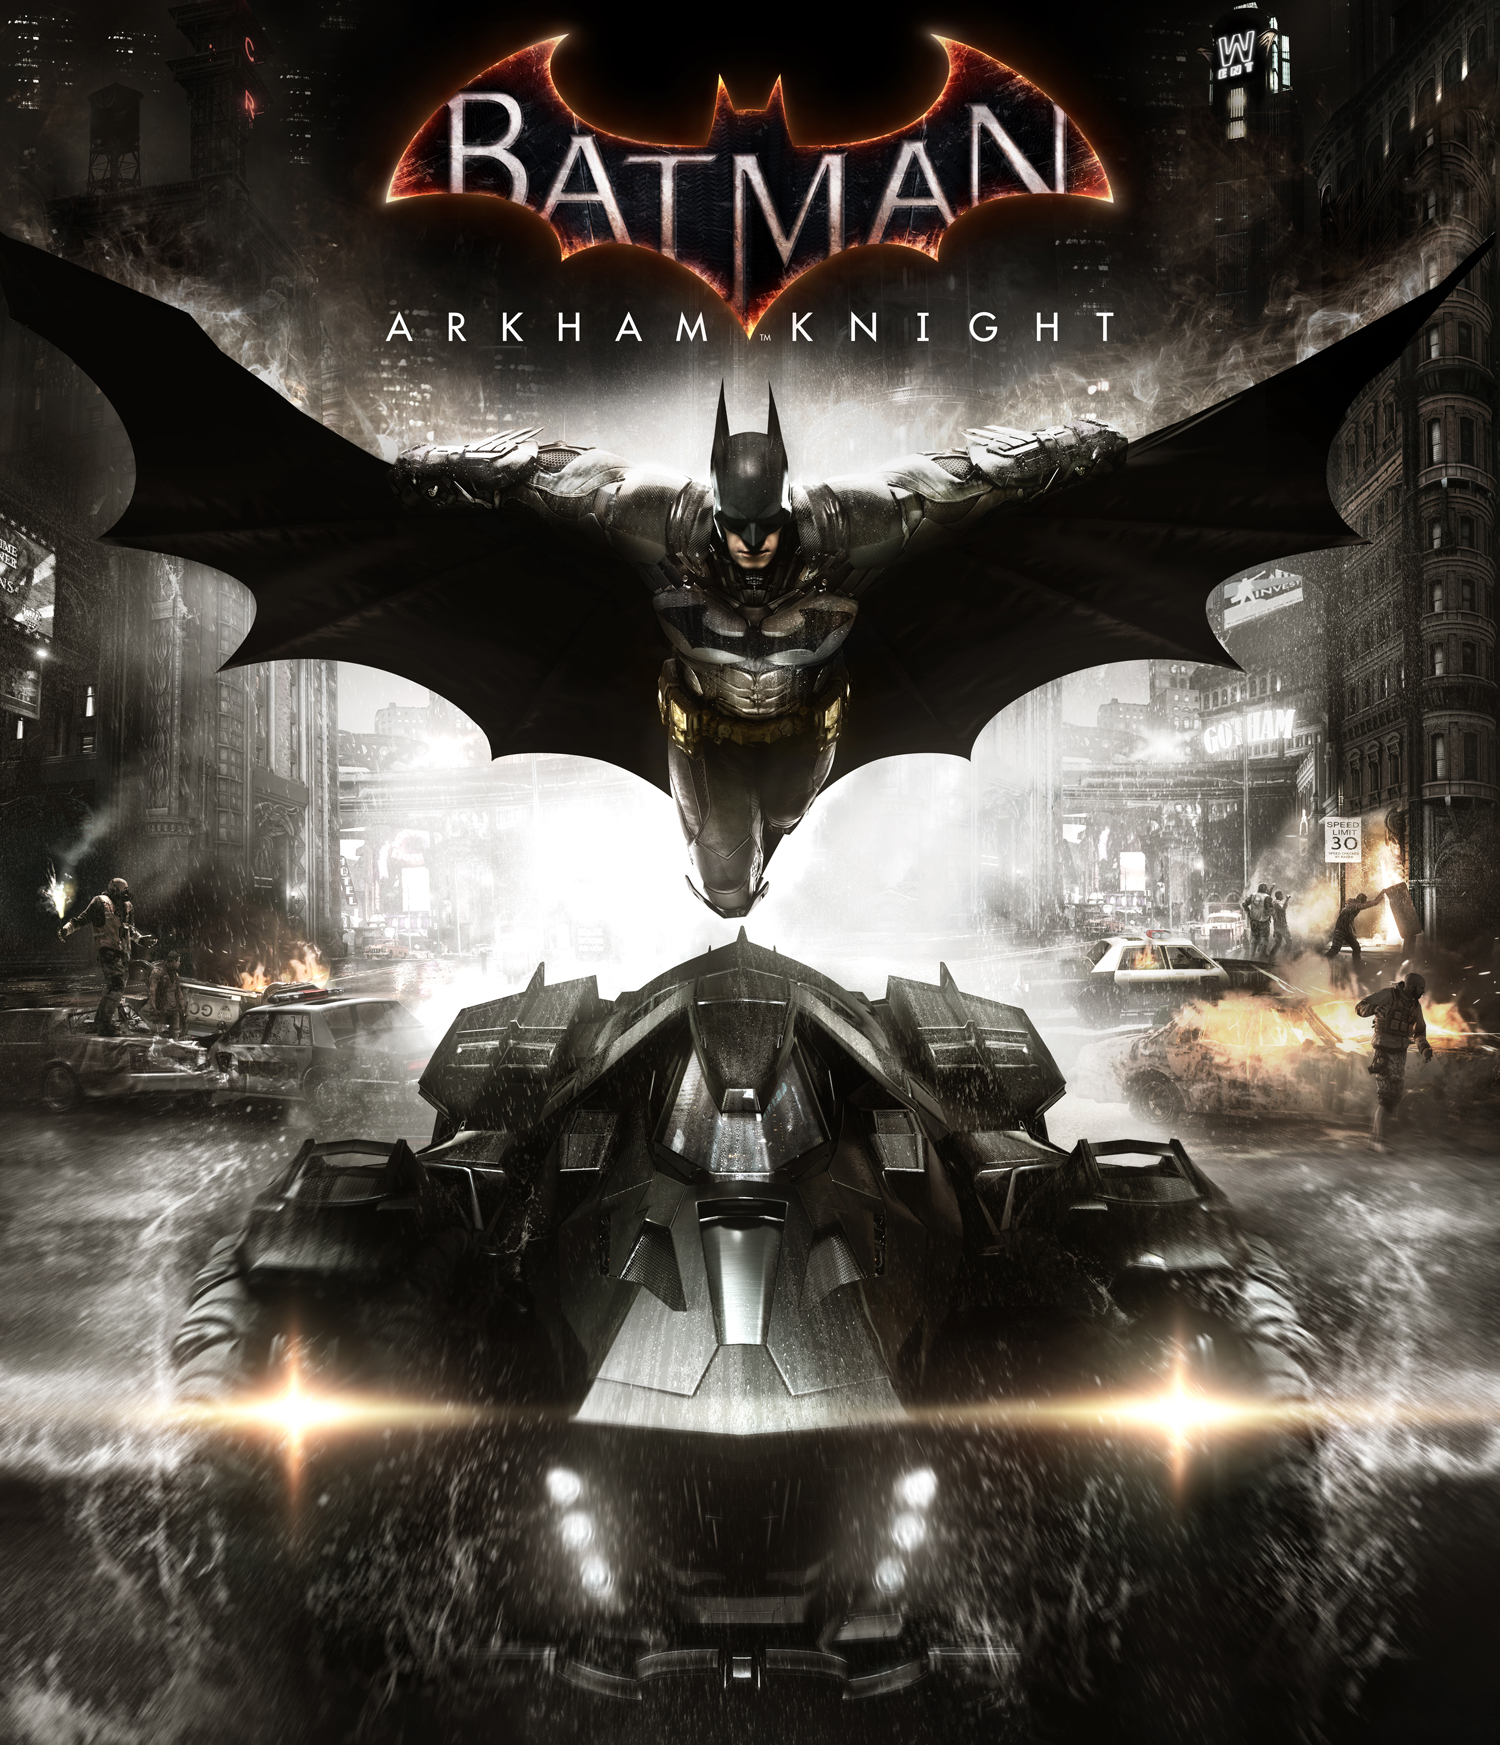 Batman Arkham Knight: Statue der Limited Edition verrät Mega-Spoiler